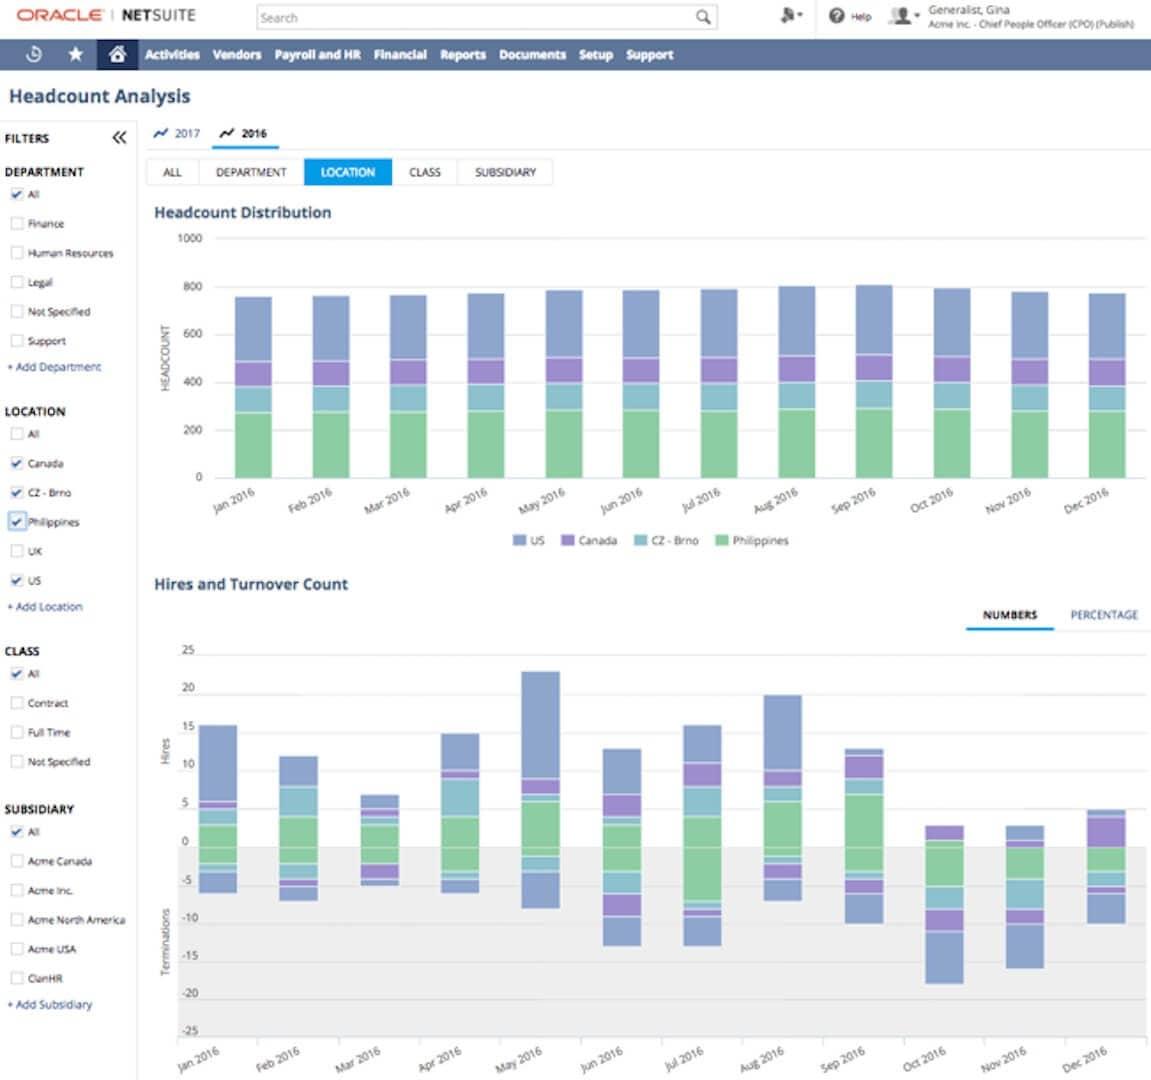 HCM Software - SuitePeople | NetSuite